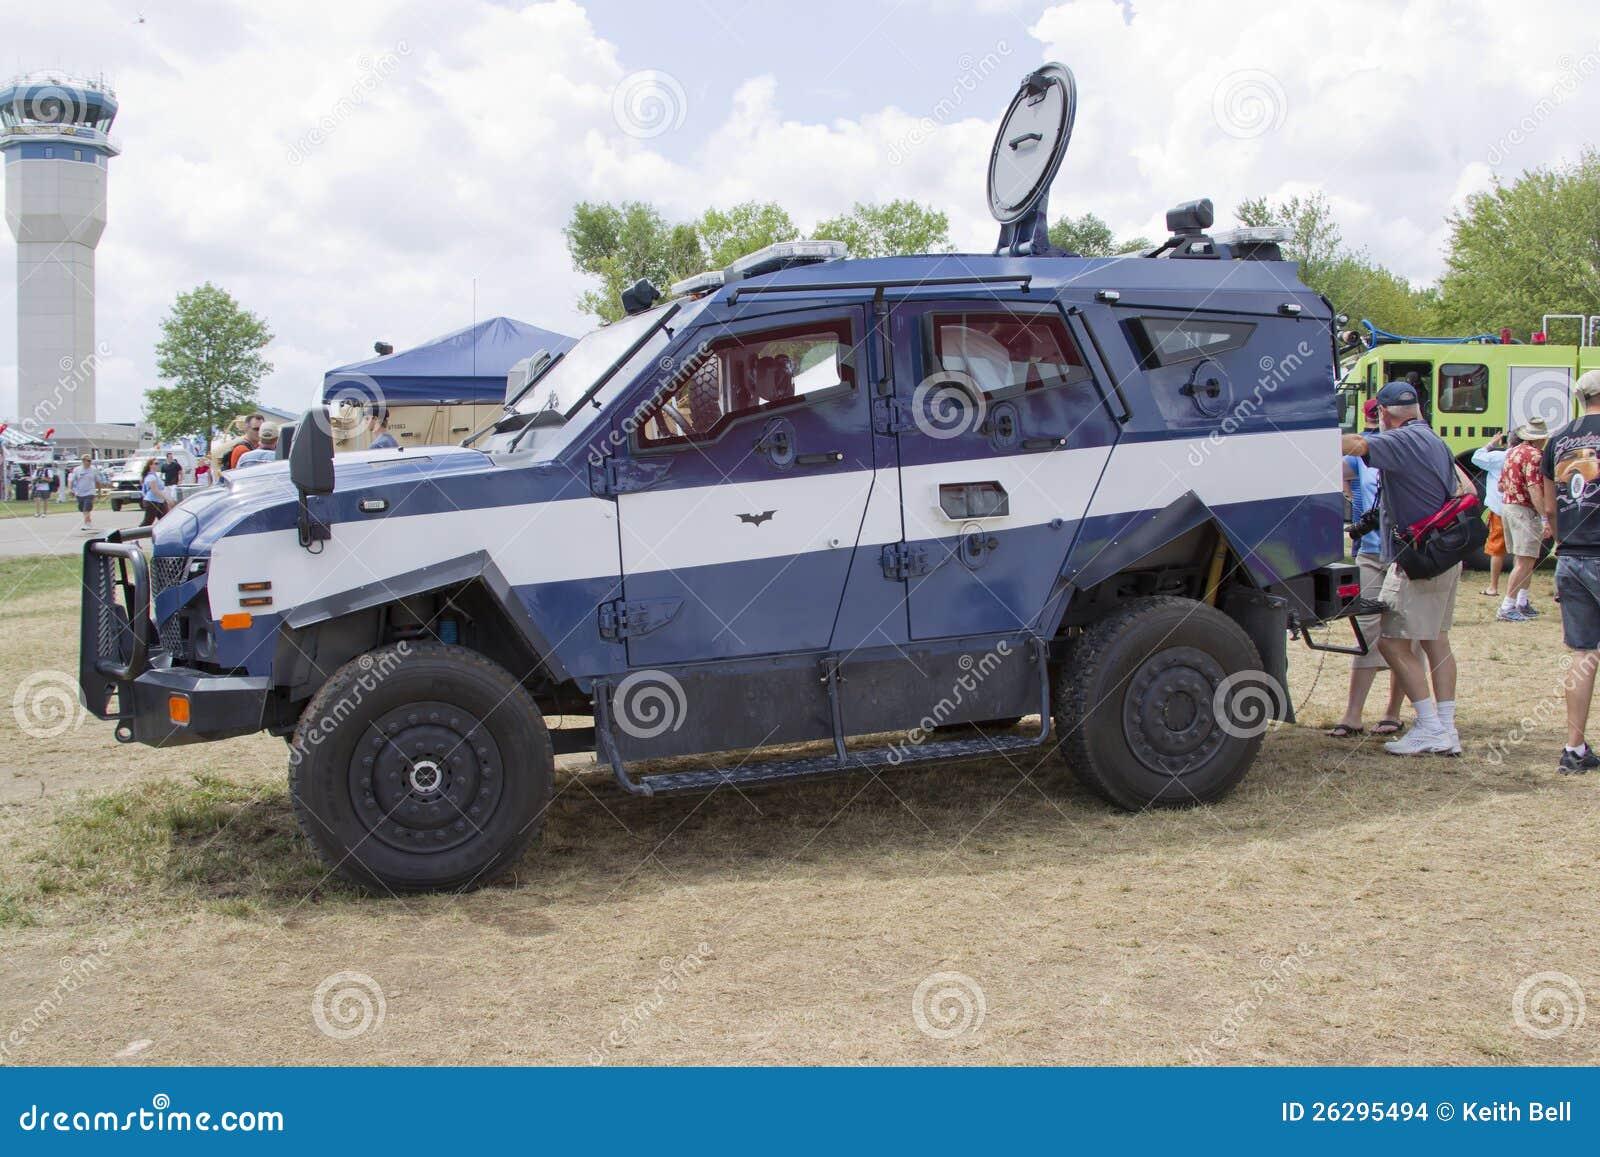 Blue And White Oshkosh Corp Tpv Miilitary Vehicle